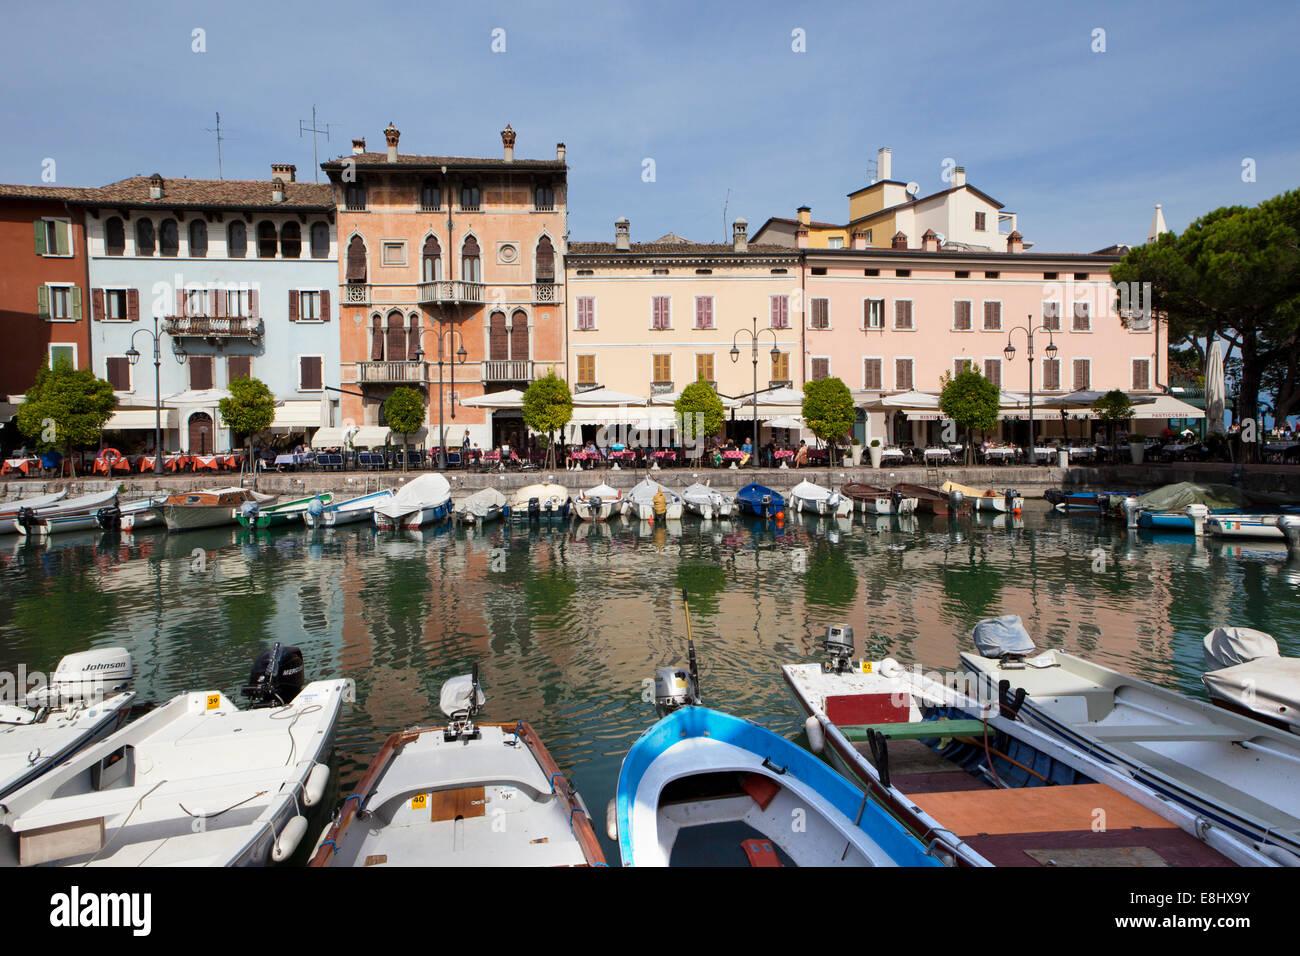 Desenzano del Garda is a town and comune in the province of Brescia, in Lombardy, Italy, on the southwestern shore Stock Photo